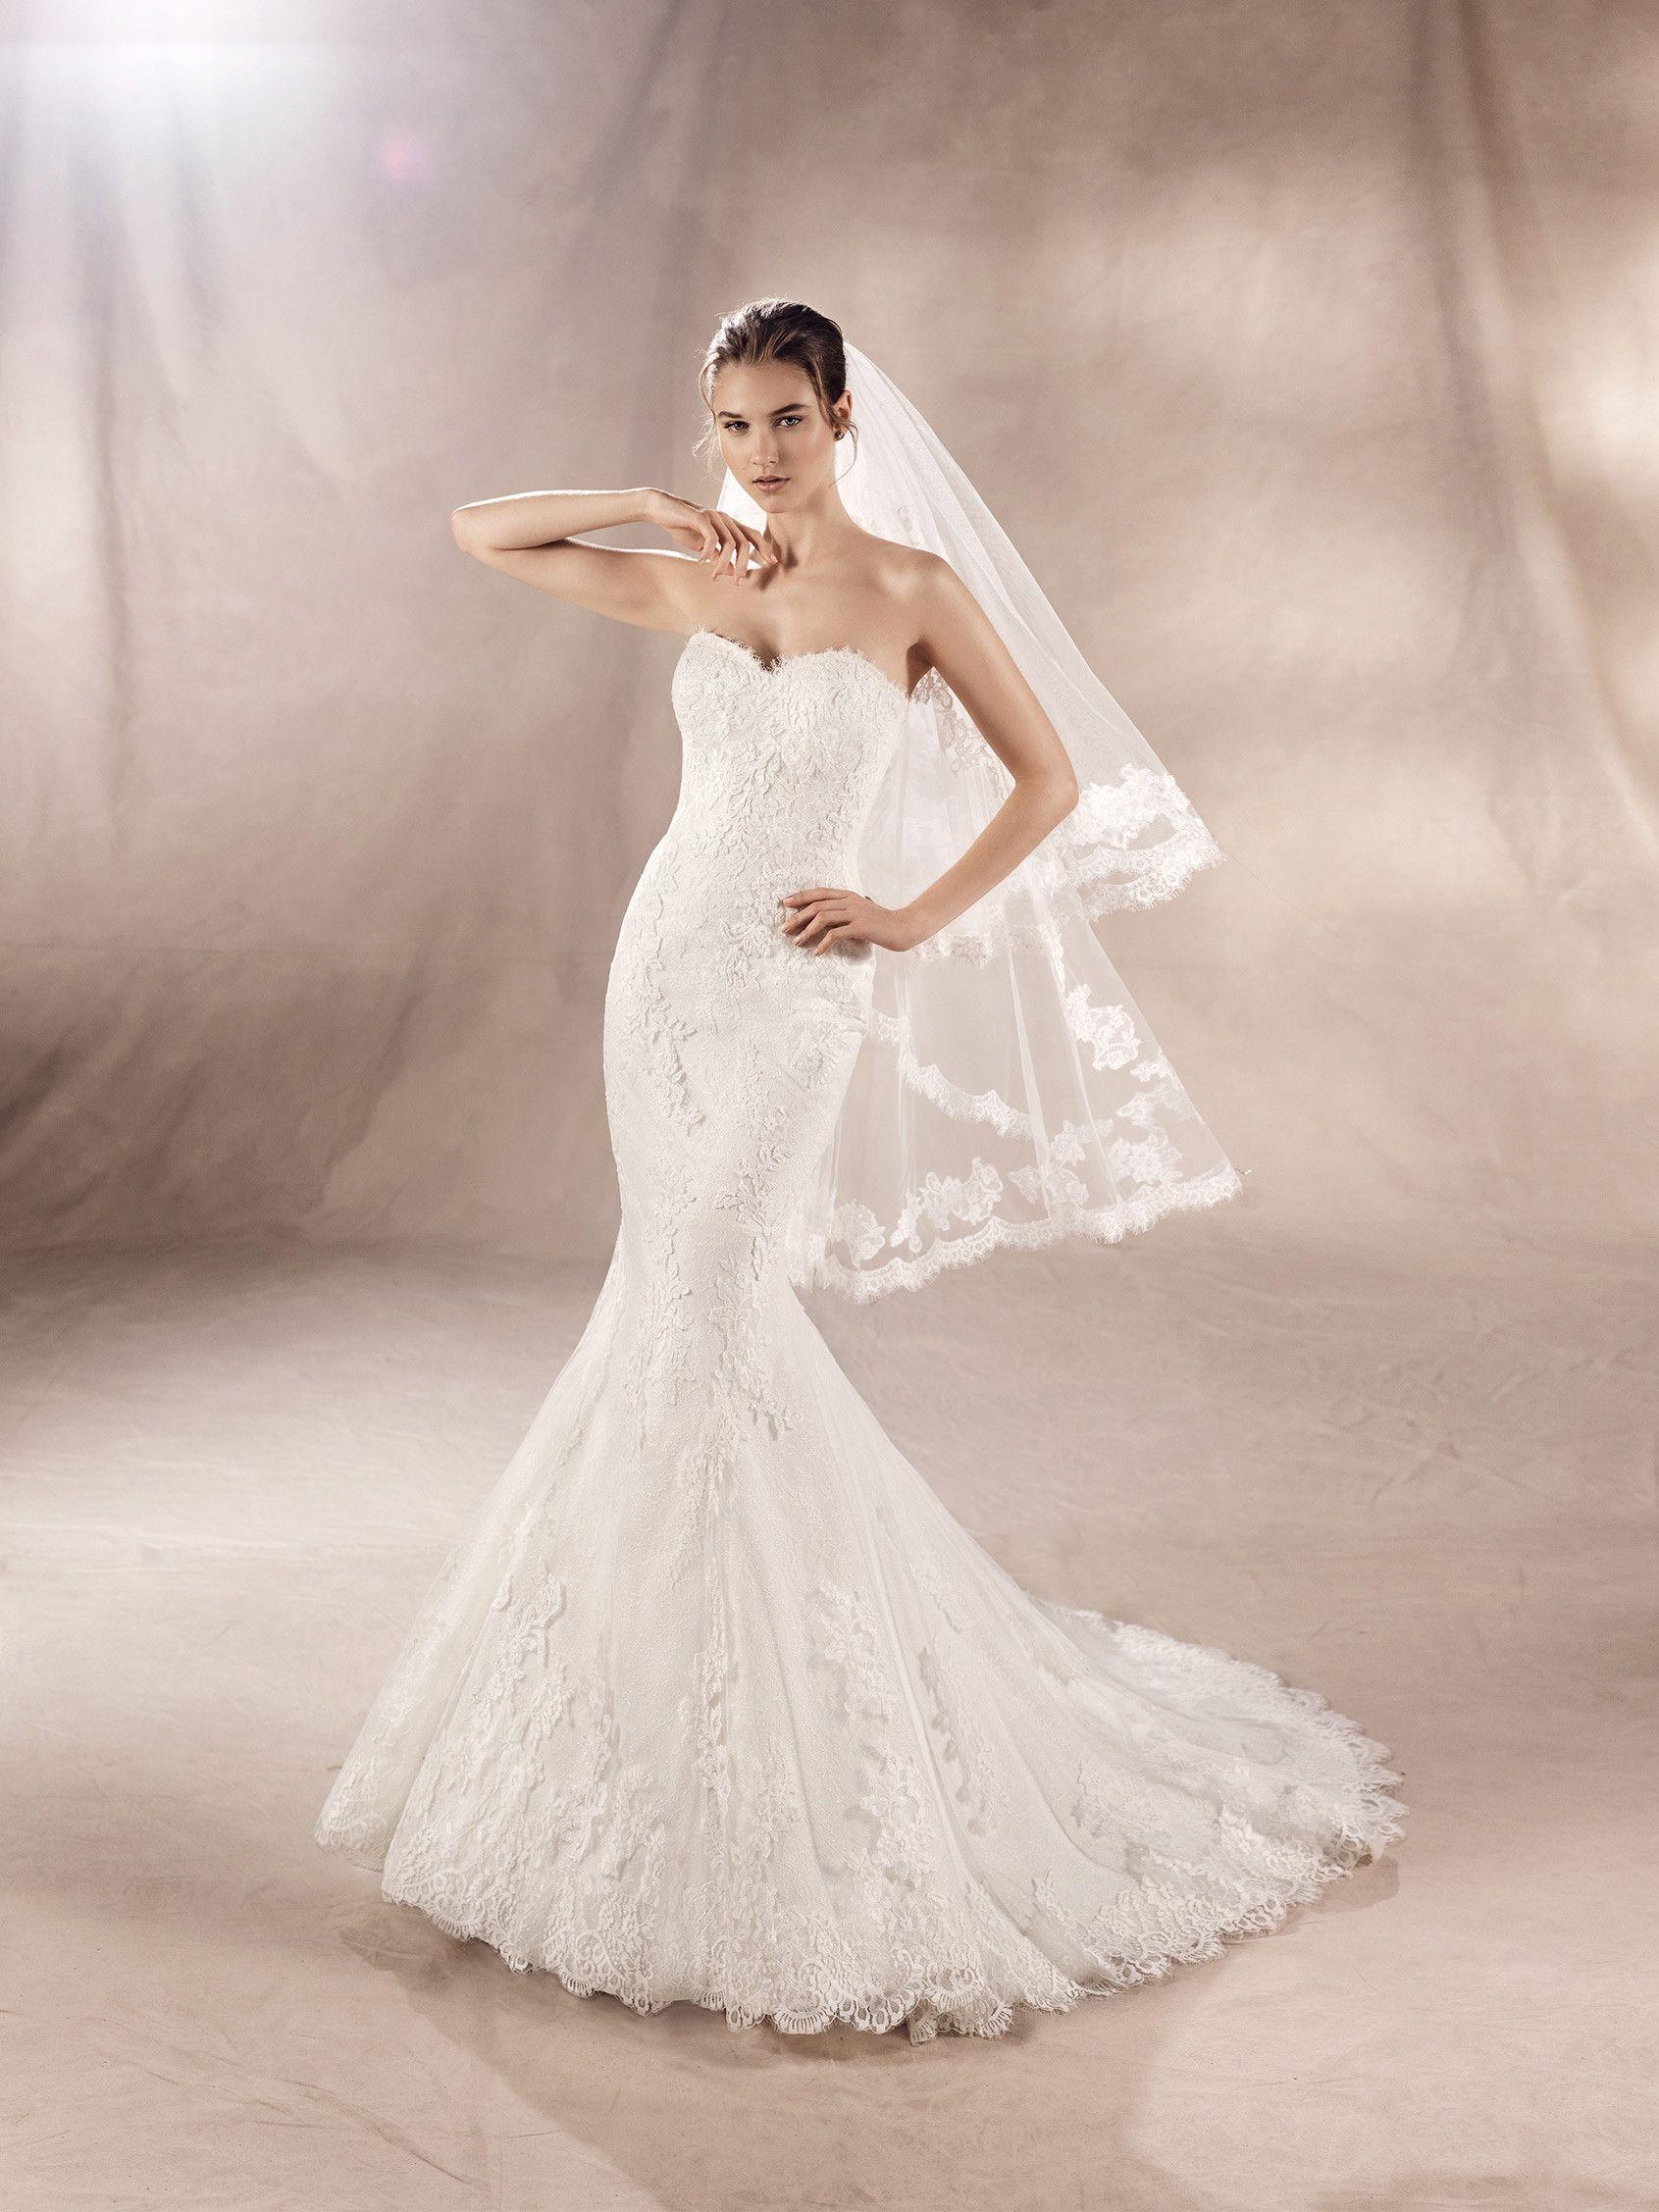 YUMEL beaded wedding dress | Hochzeit Julia&Markus | Pinterest ...